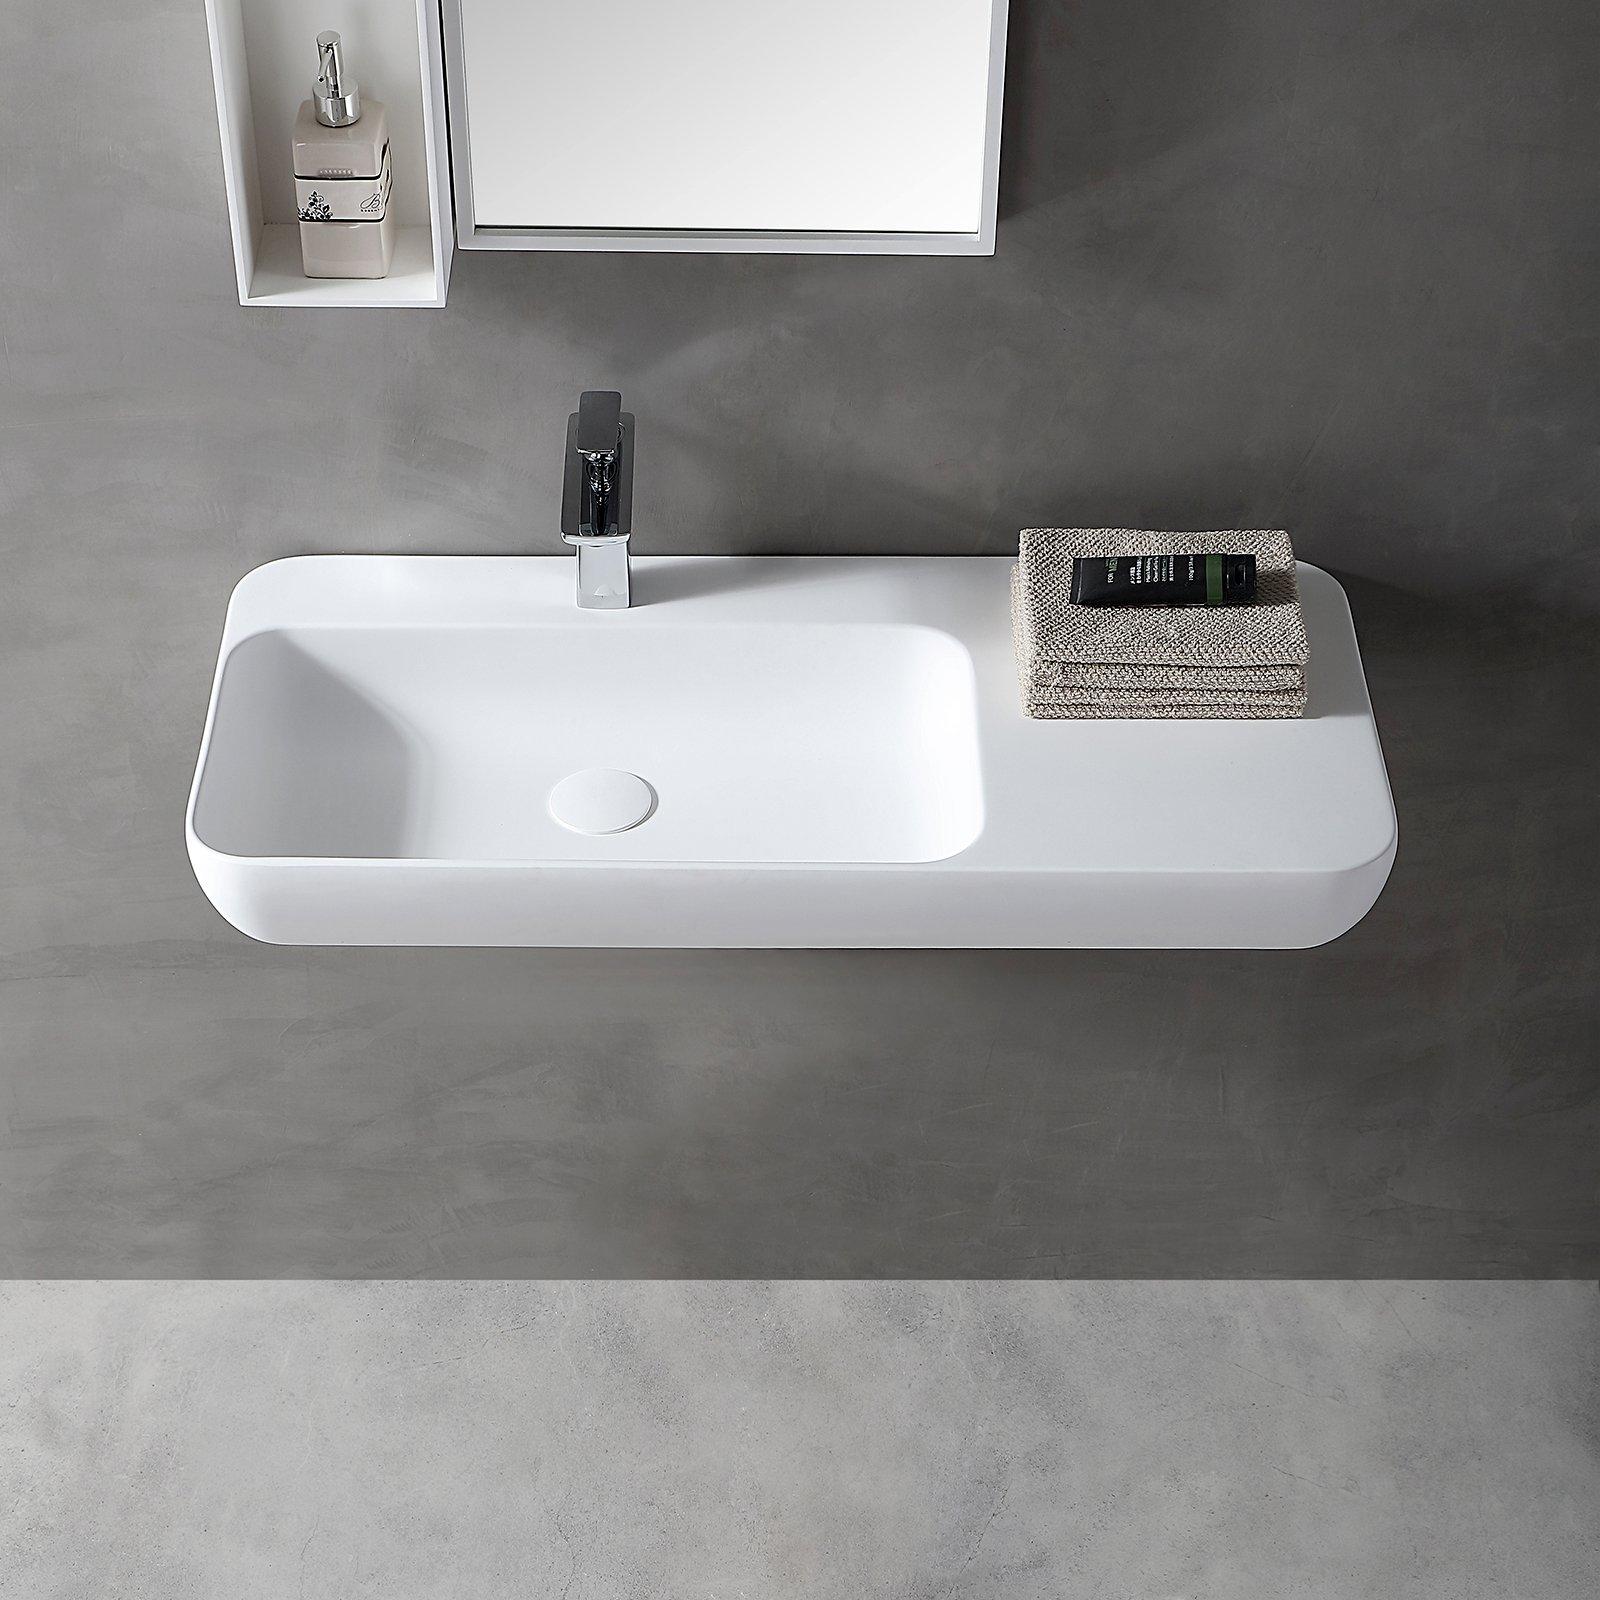 Wandwaschbecken Aufsatzwaschbecken TWG202 aus Mineralguss Solid Stone - Weiß matt - 90x40x12cm zoom thumbnail 3